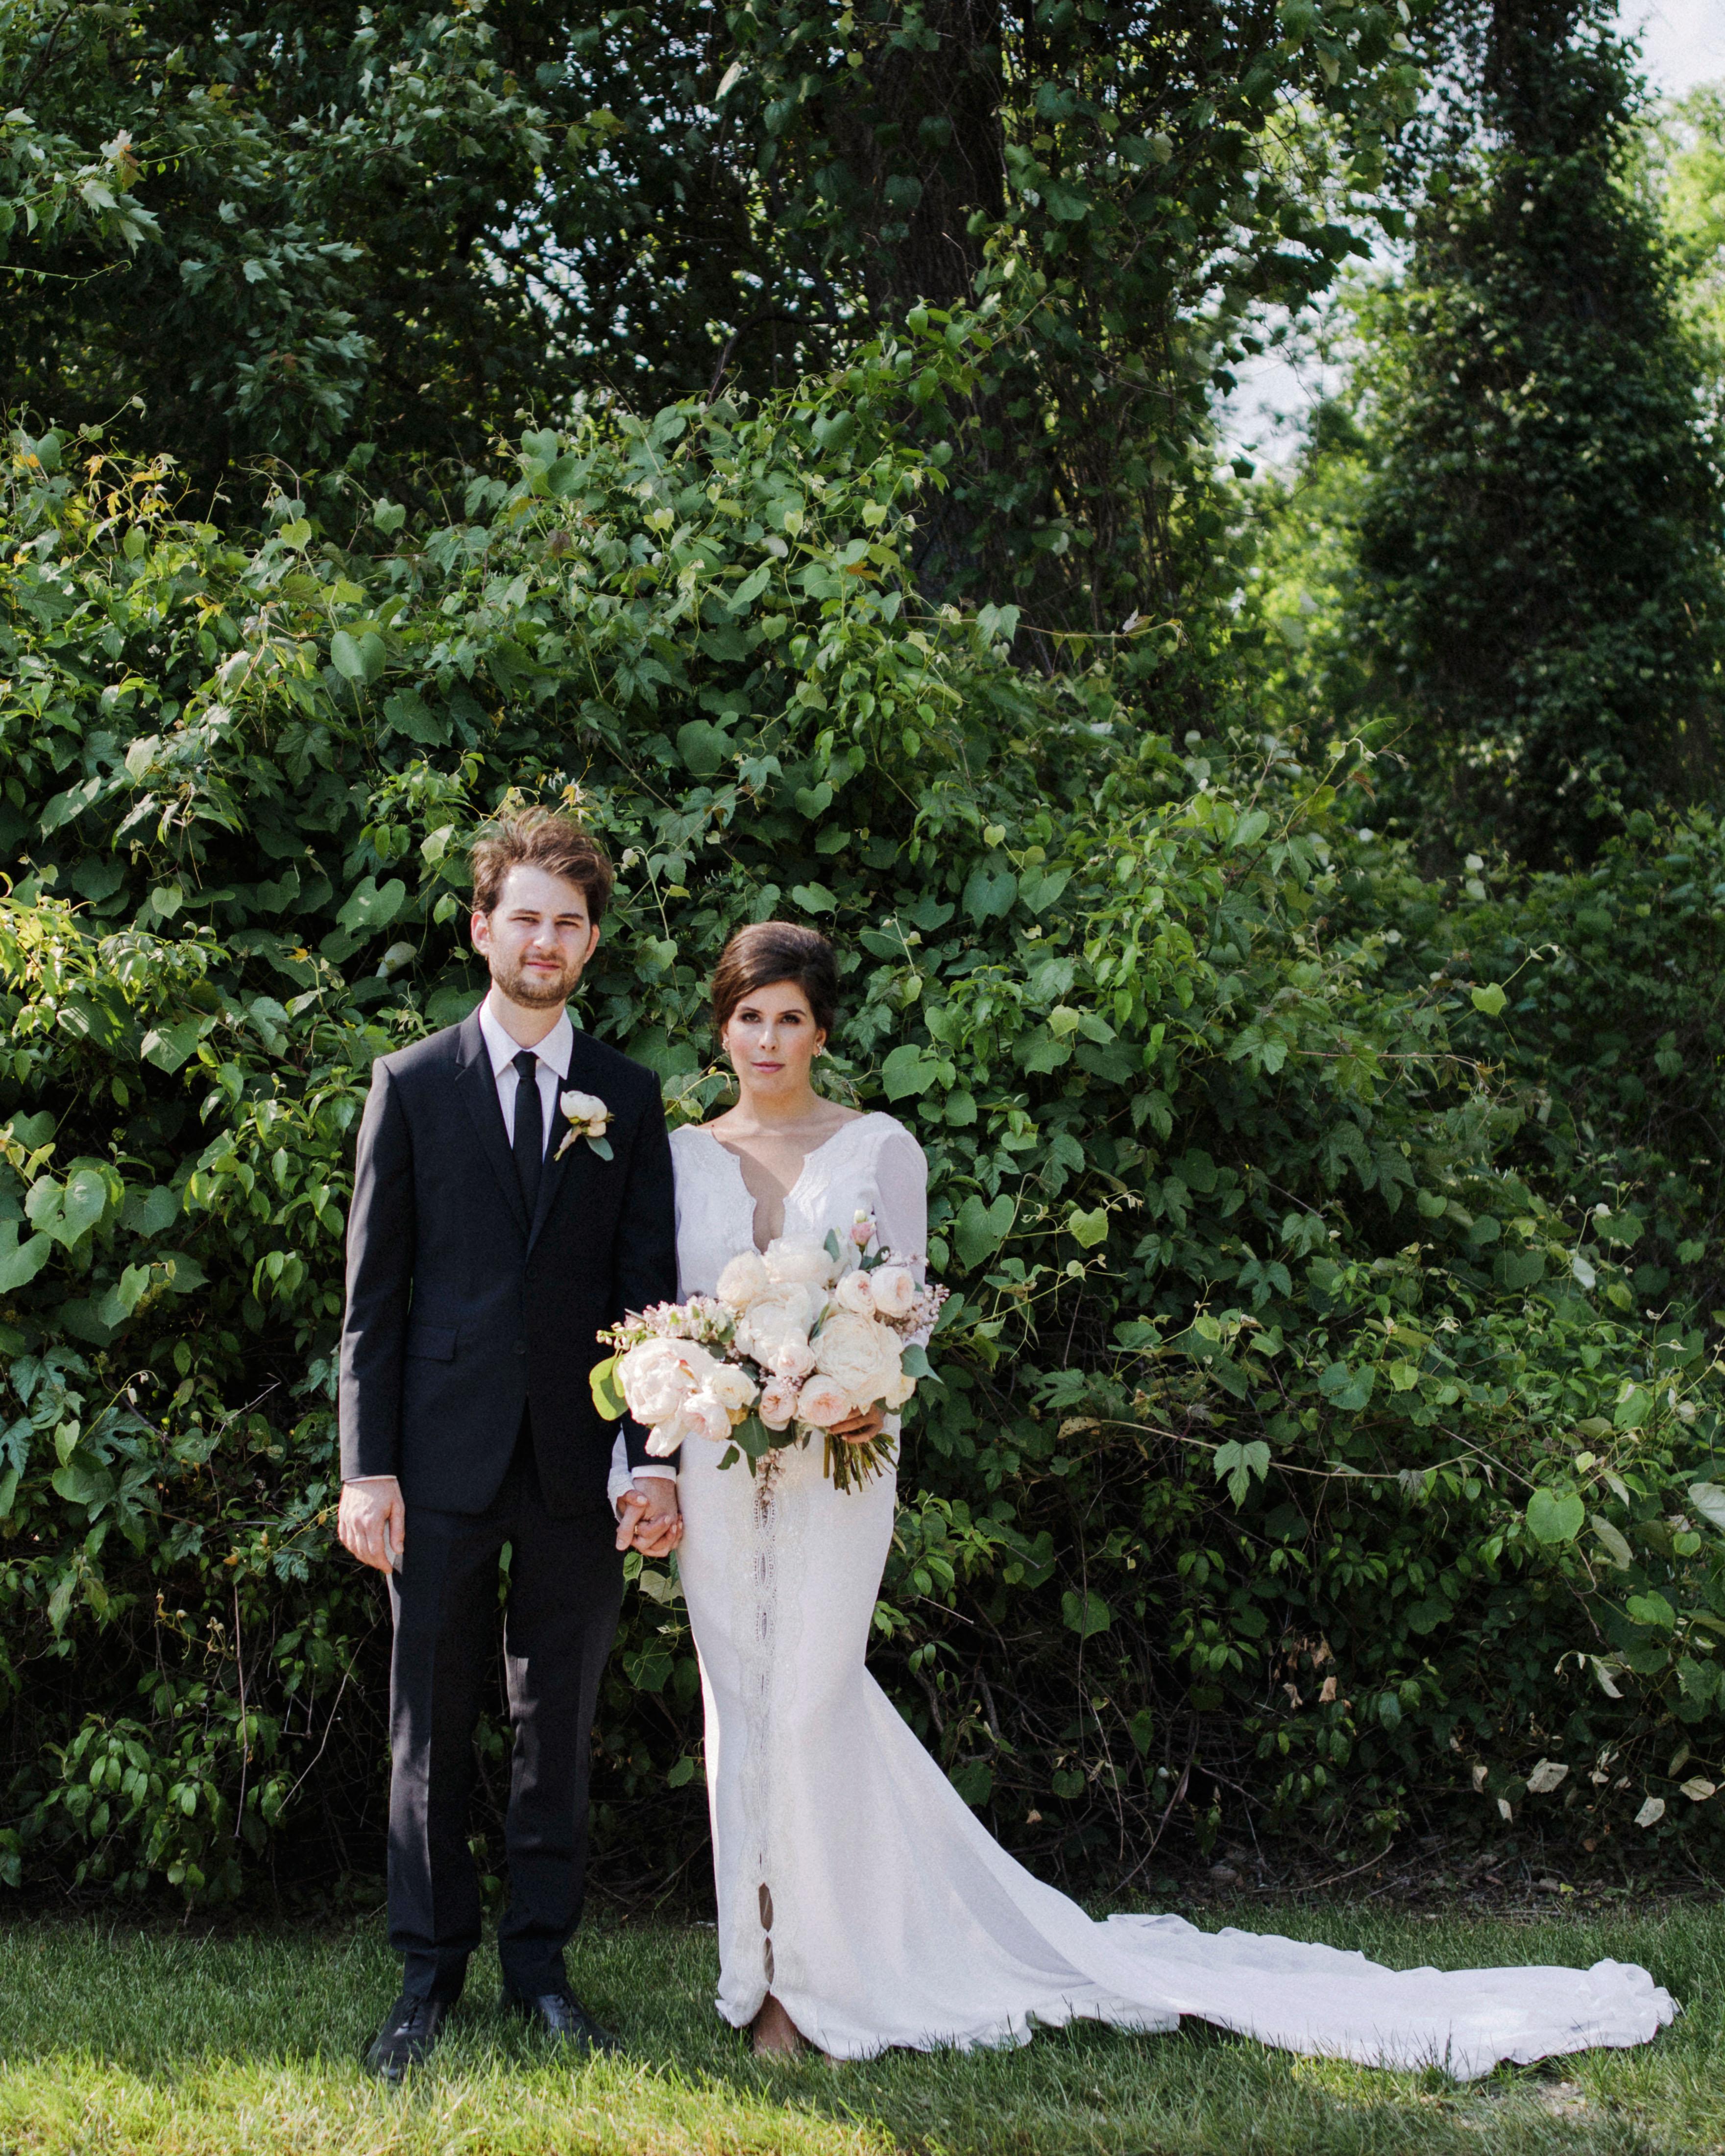 eden jack wedding couple serious greenery